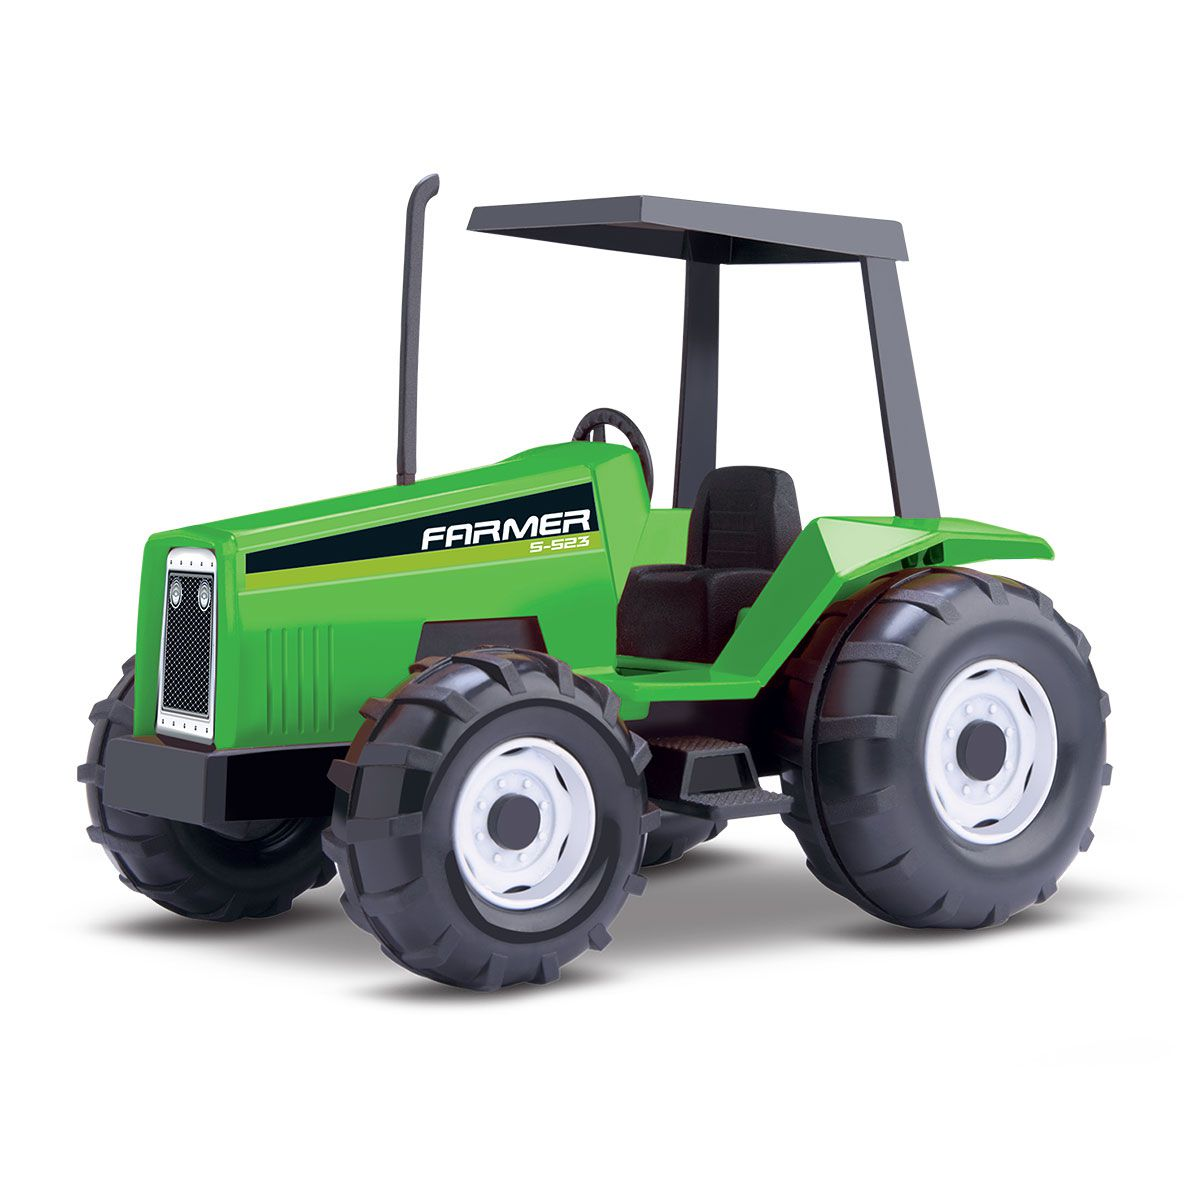 Trator Farmer S-523 093